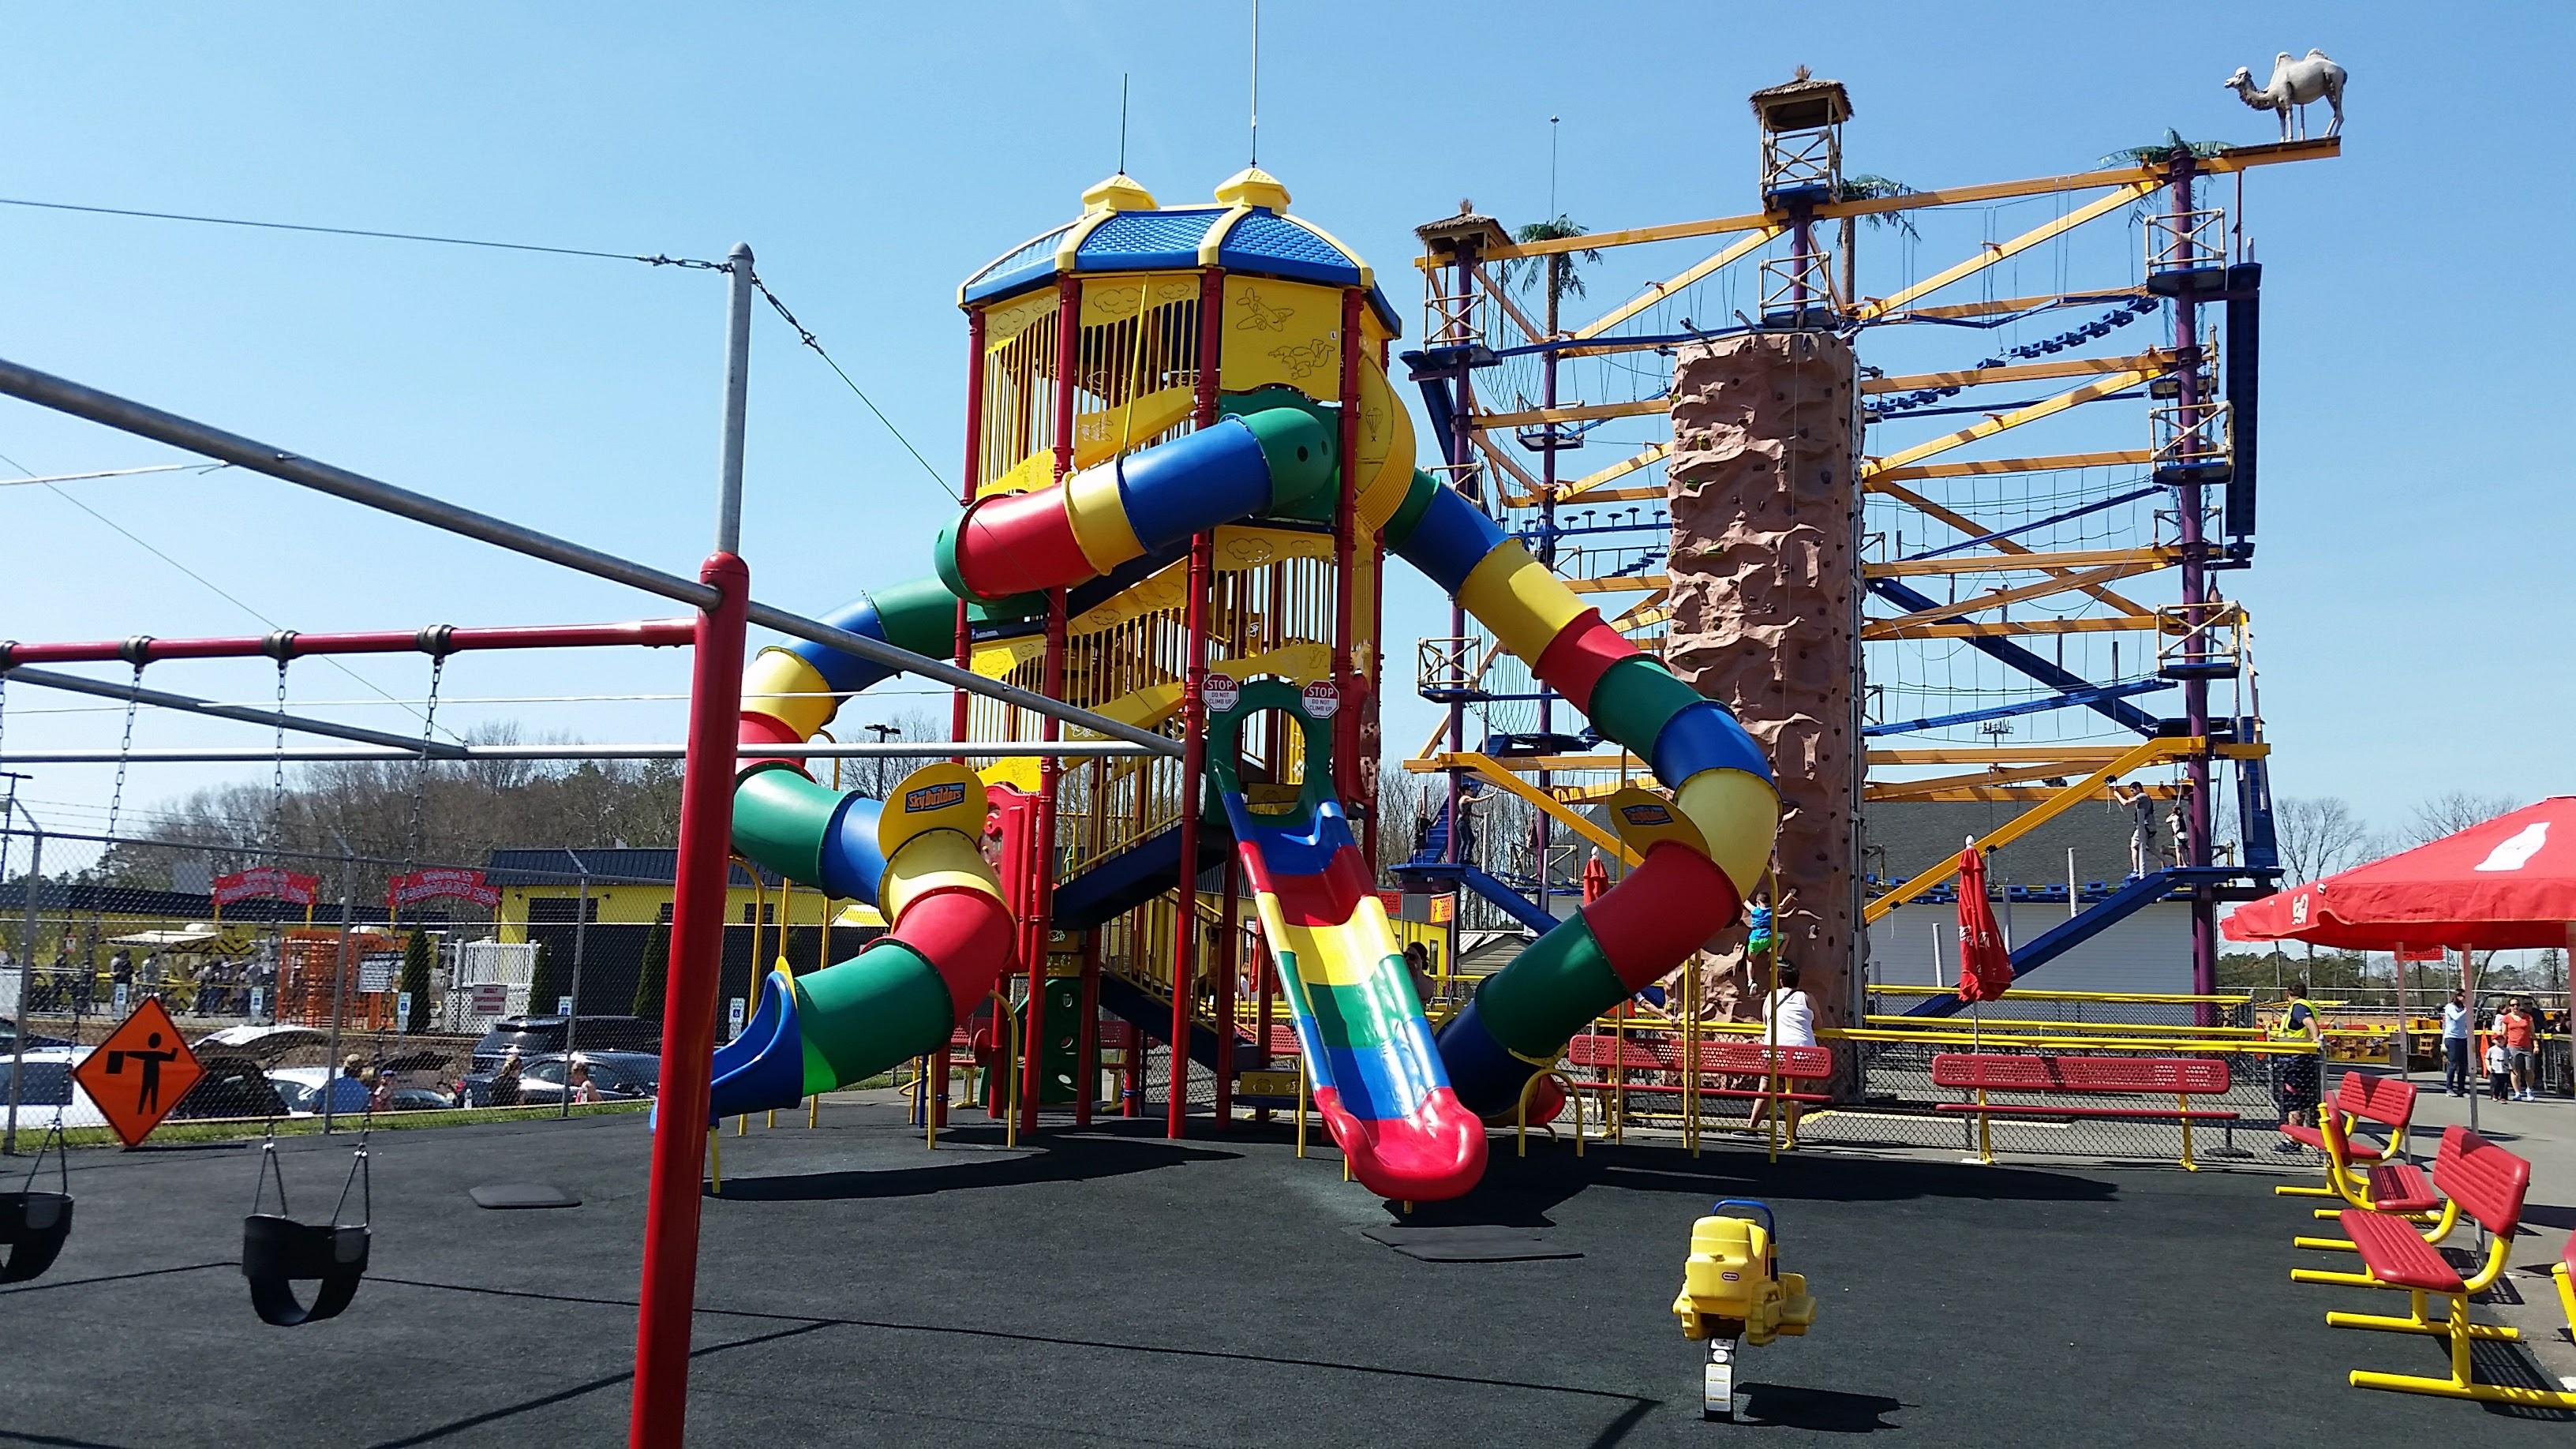 Playground at Diggerland USA theme park